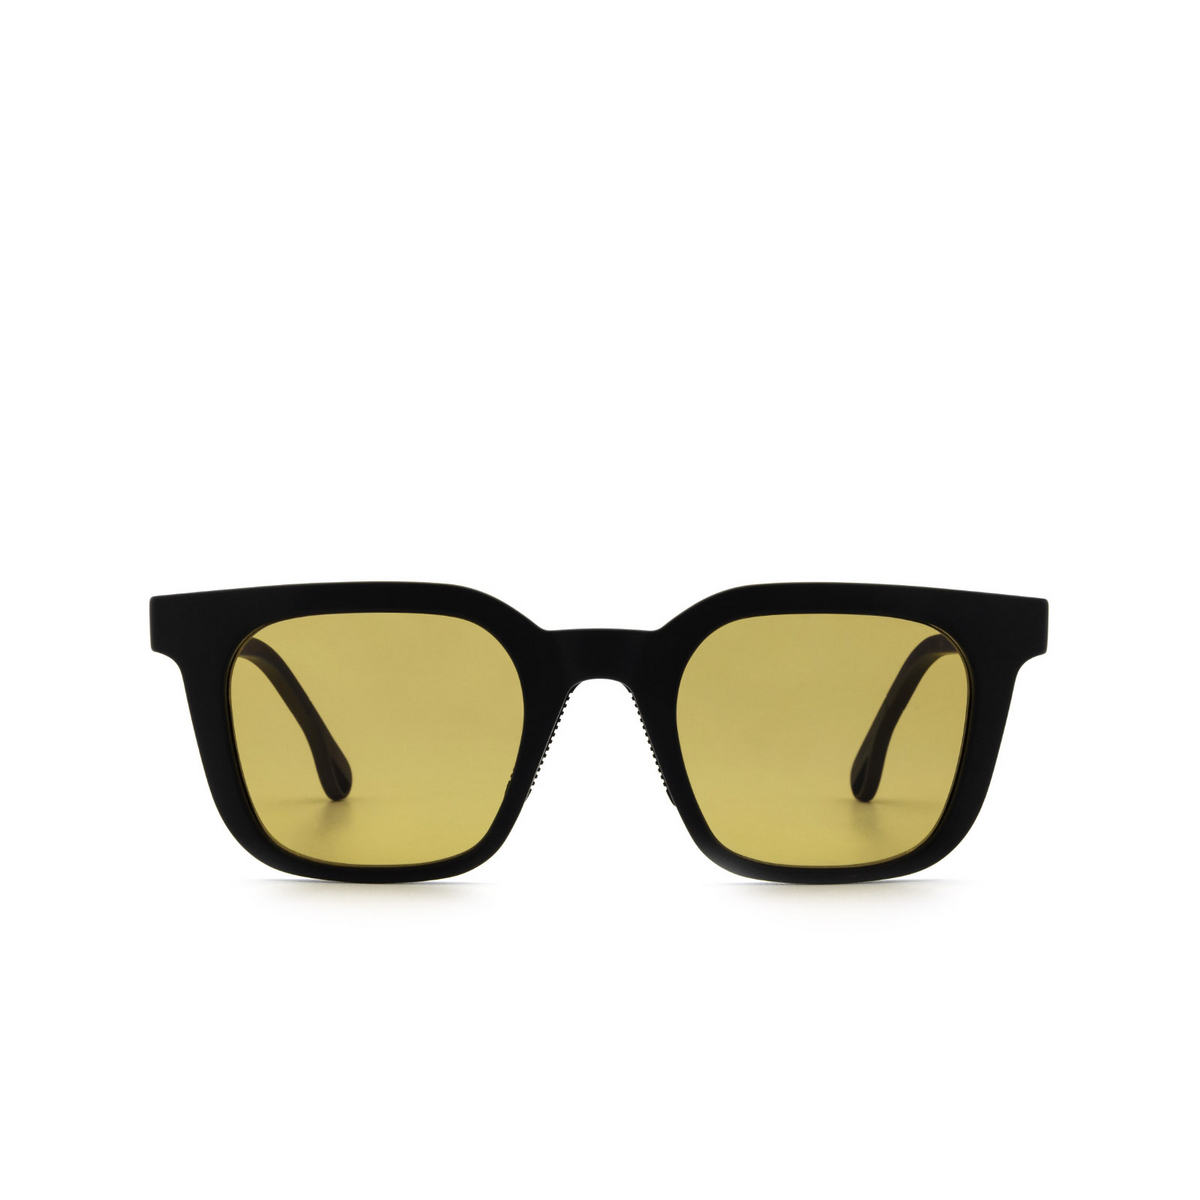 Chimi® Square Sunglasses: 04 ACTIVE color Black - front view.